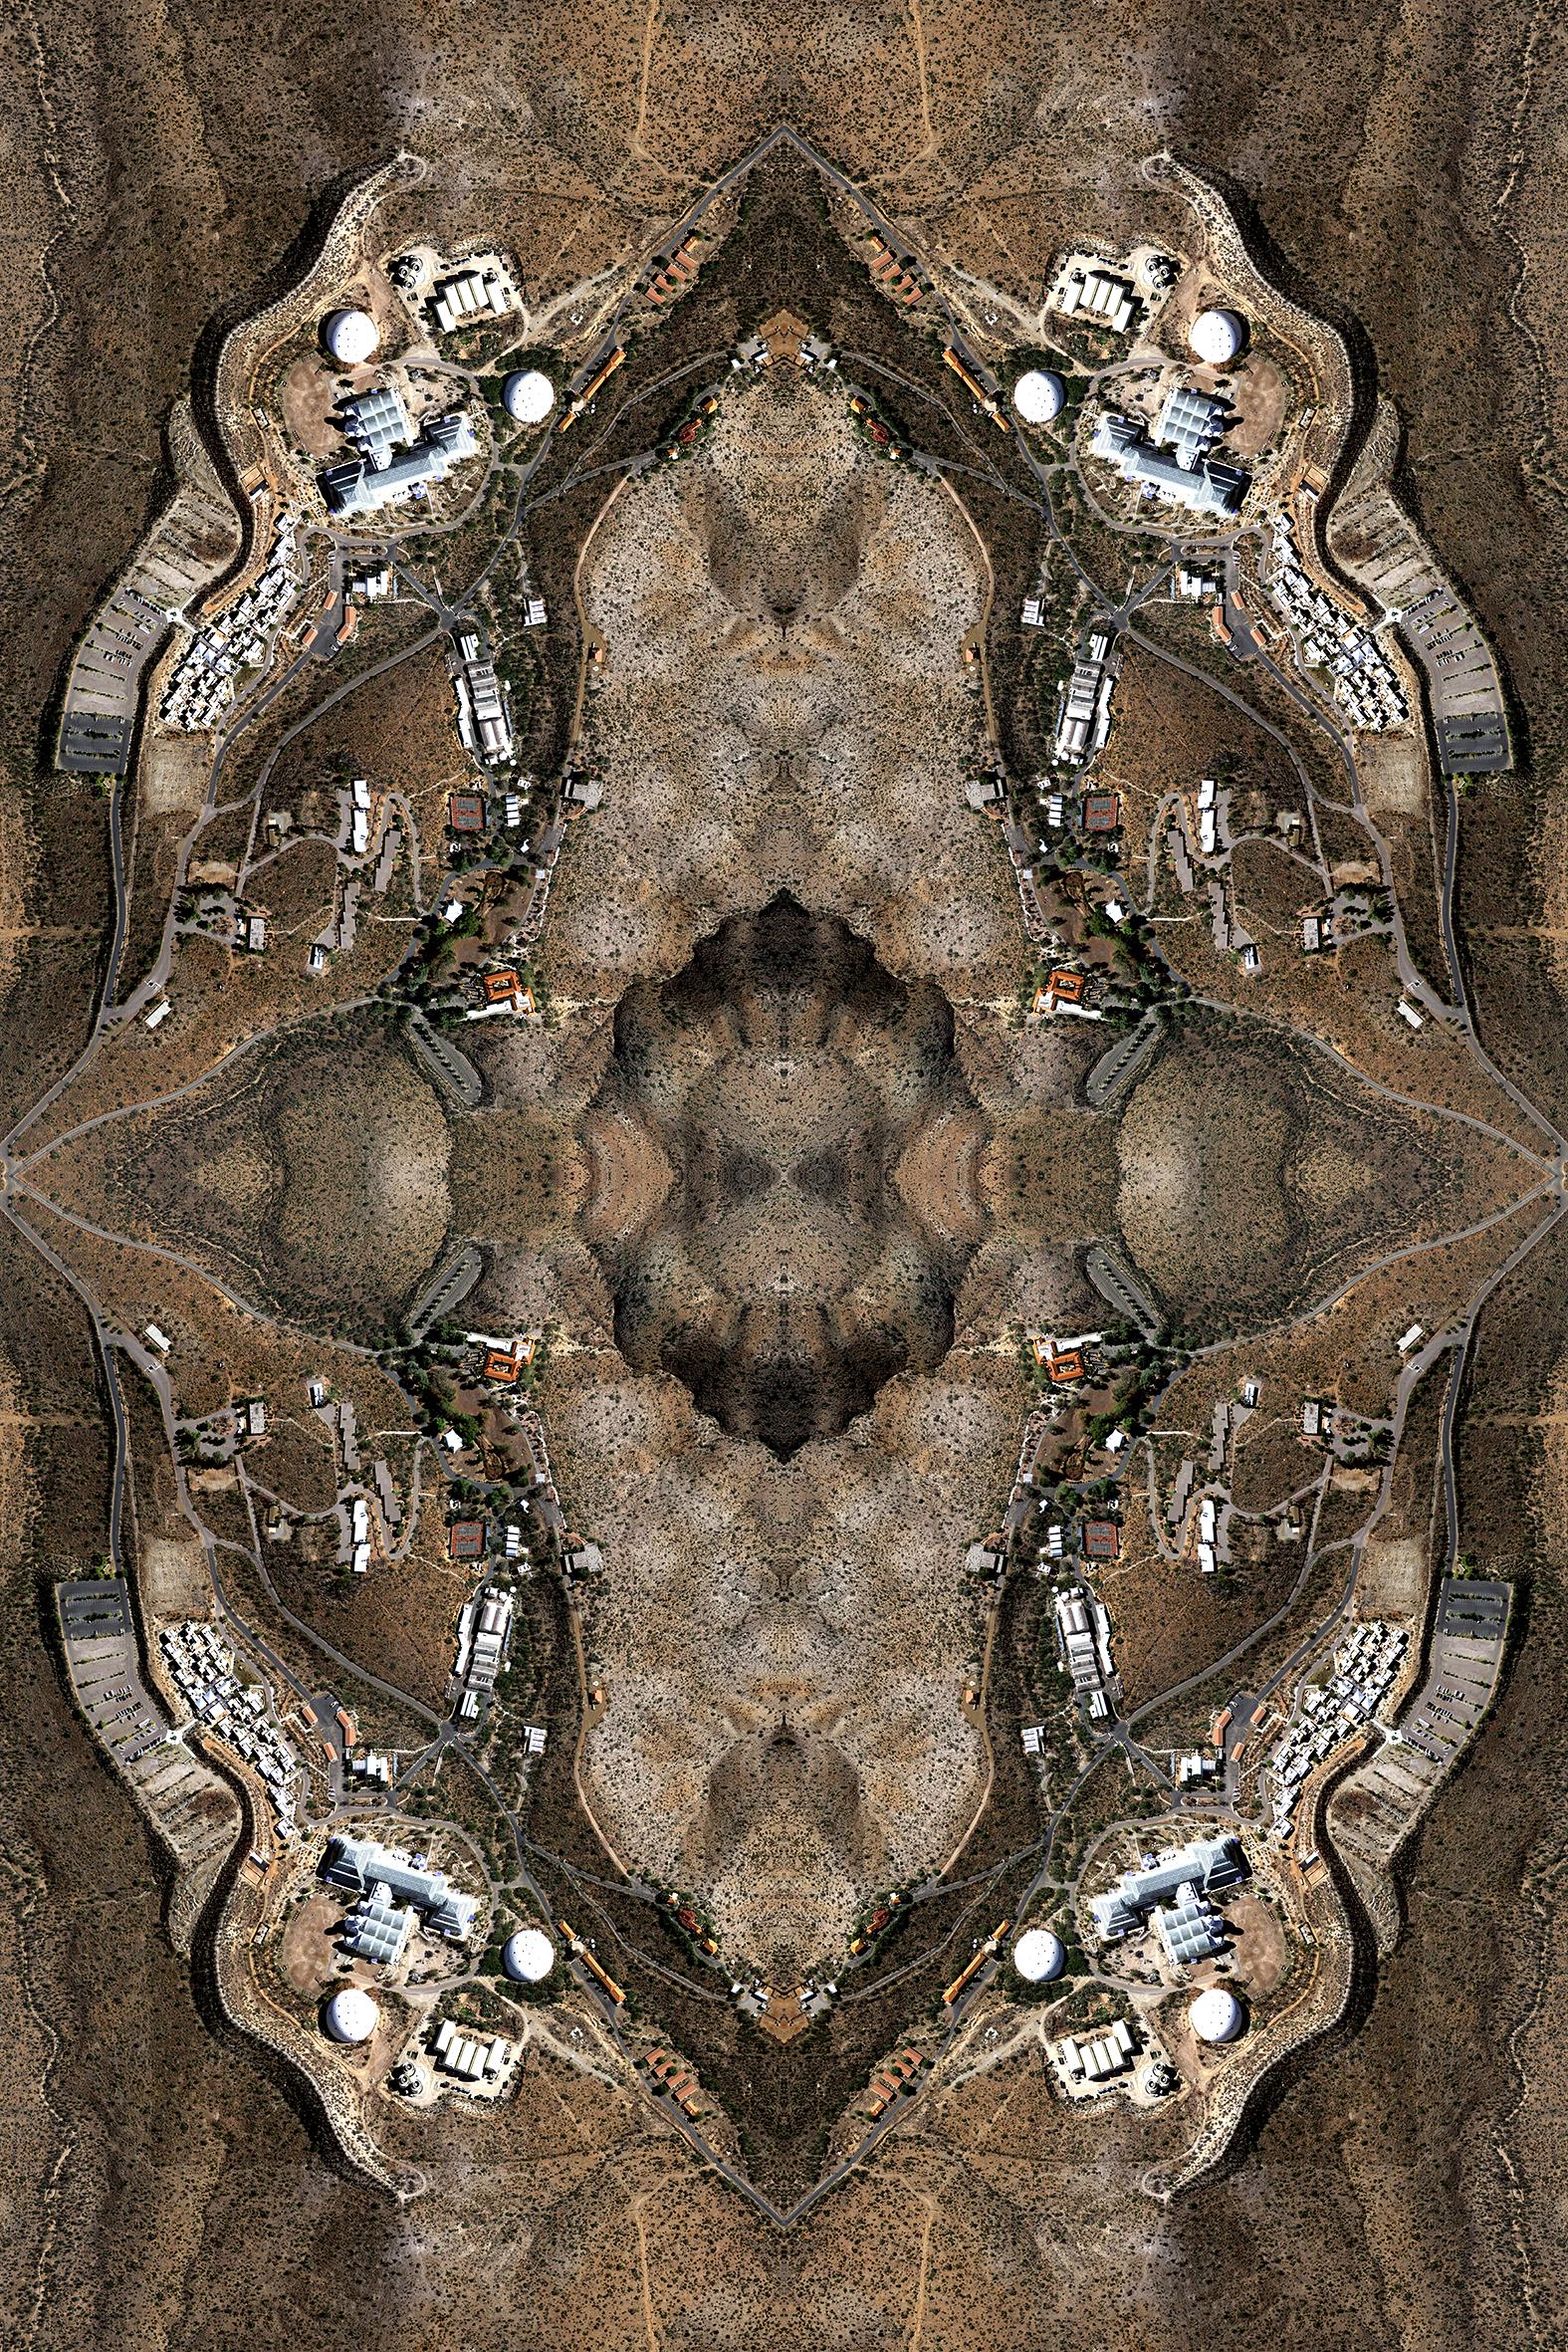 Biosphere 2,Oracle, AZ, United States Master_Complete.jpg